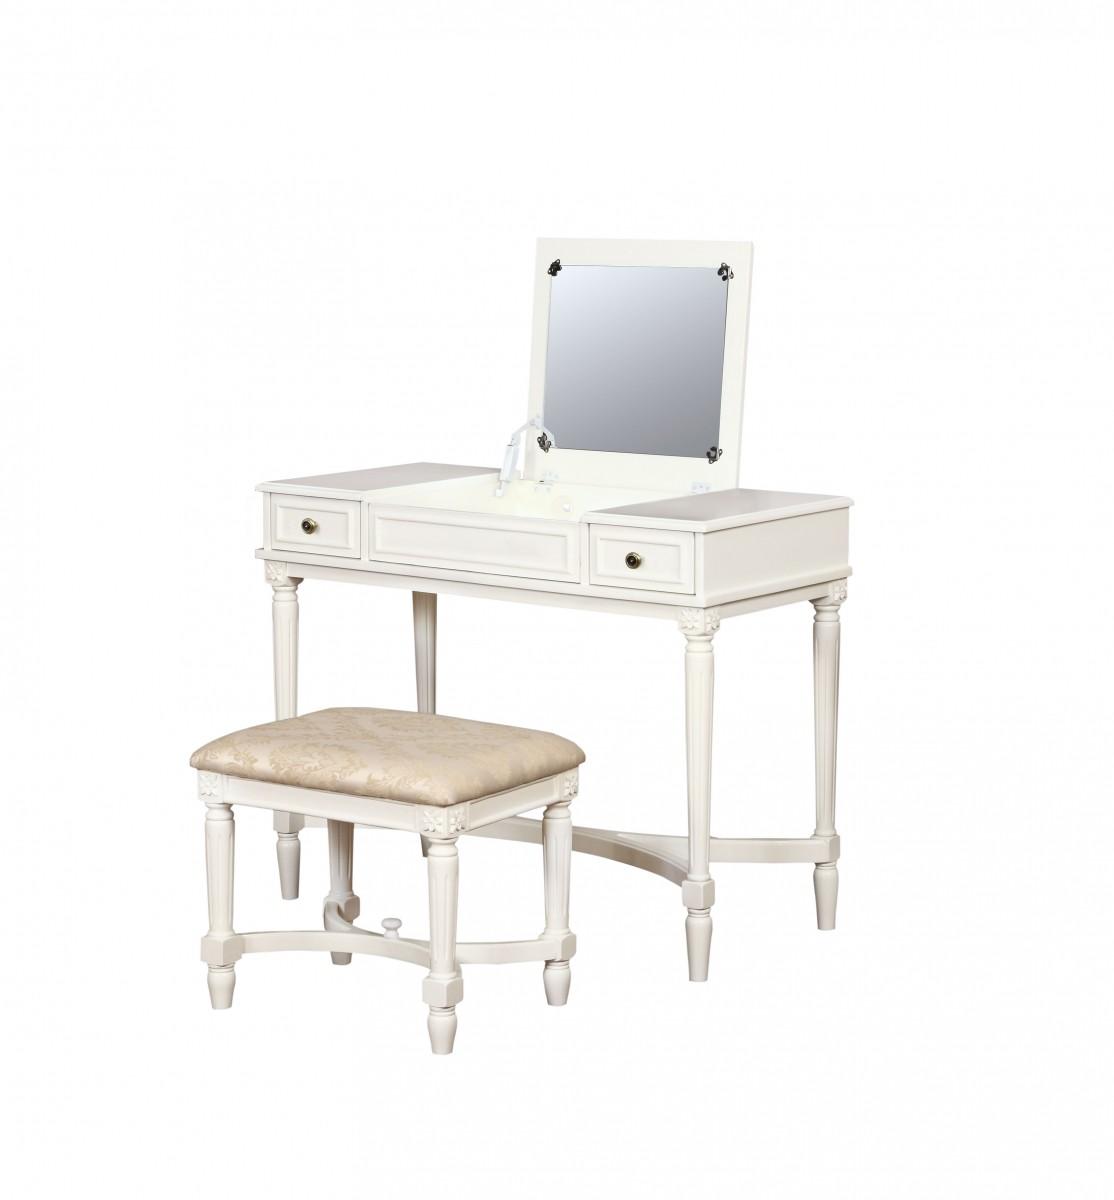 Linon Home Decor Products Inc. Cyndi White 2-Piece Vanity